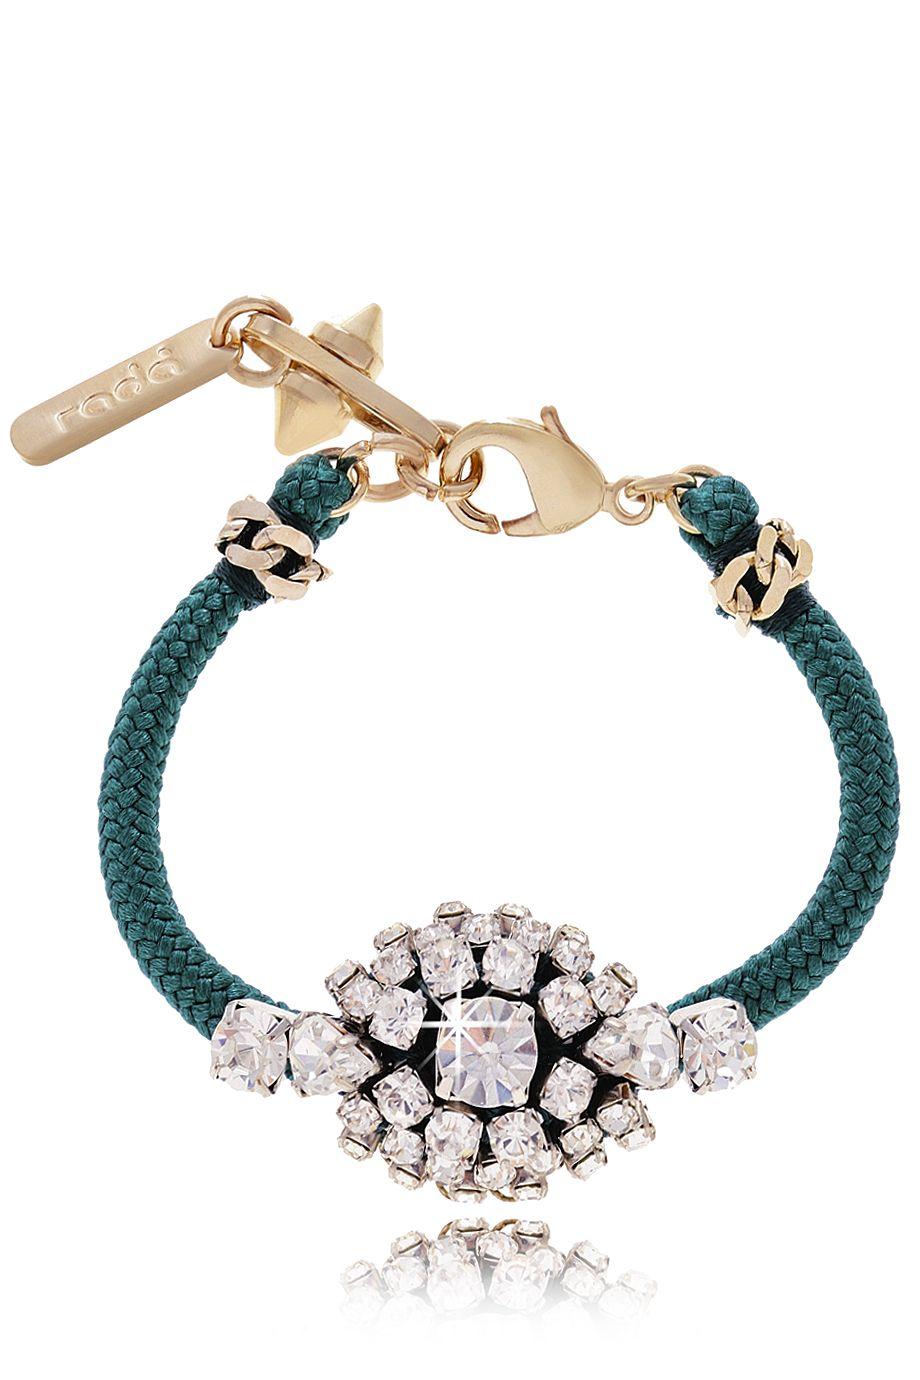 RADÀ LENEXA Petrol Cord Bracelet - ACCESSORIES | JEWELRY | Bracelets | PRET-A-BEAUTE.COM